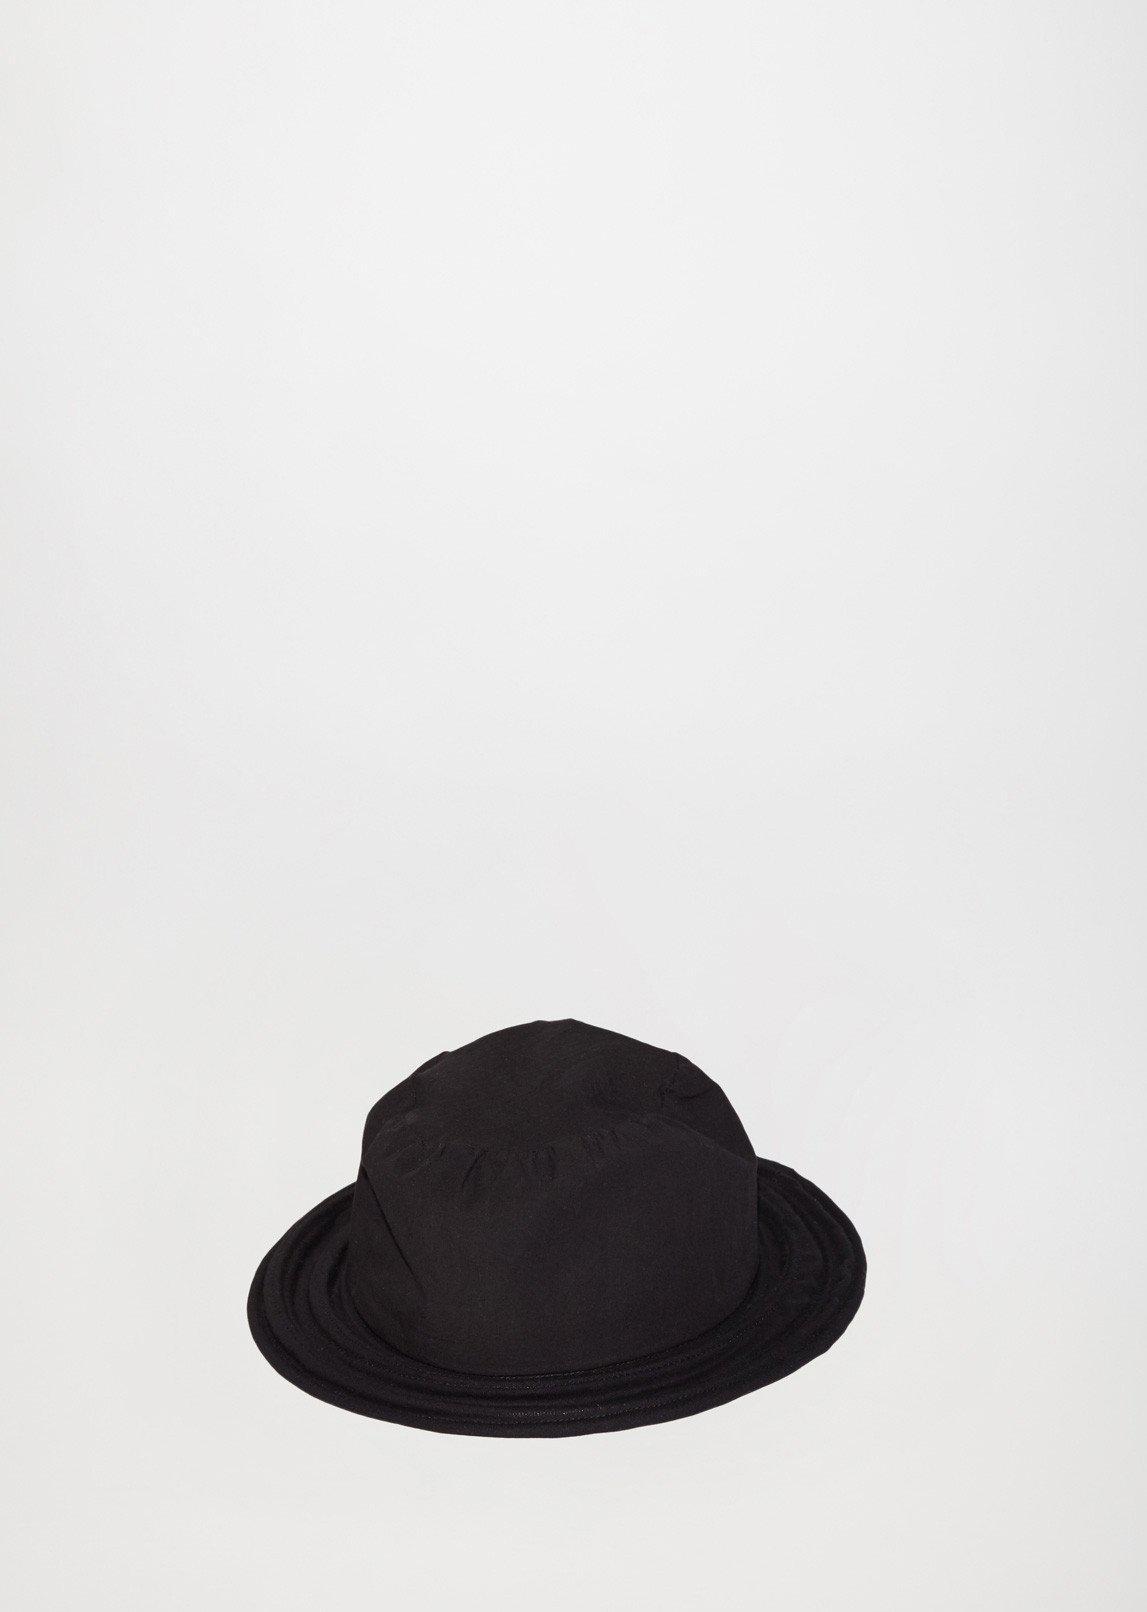 ed329b93d9a25c Lyst - Yohji Yamamoto Crinoline Cloche Hat in Black